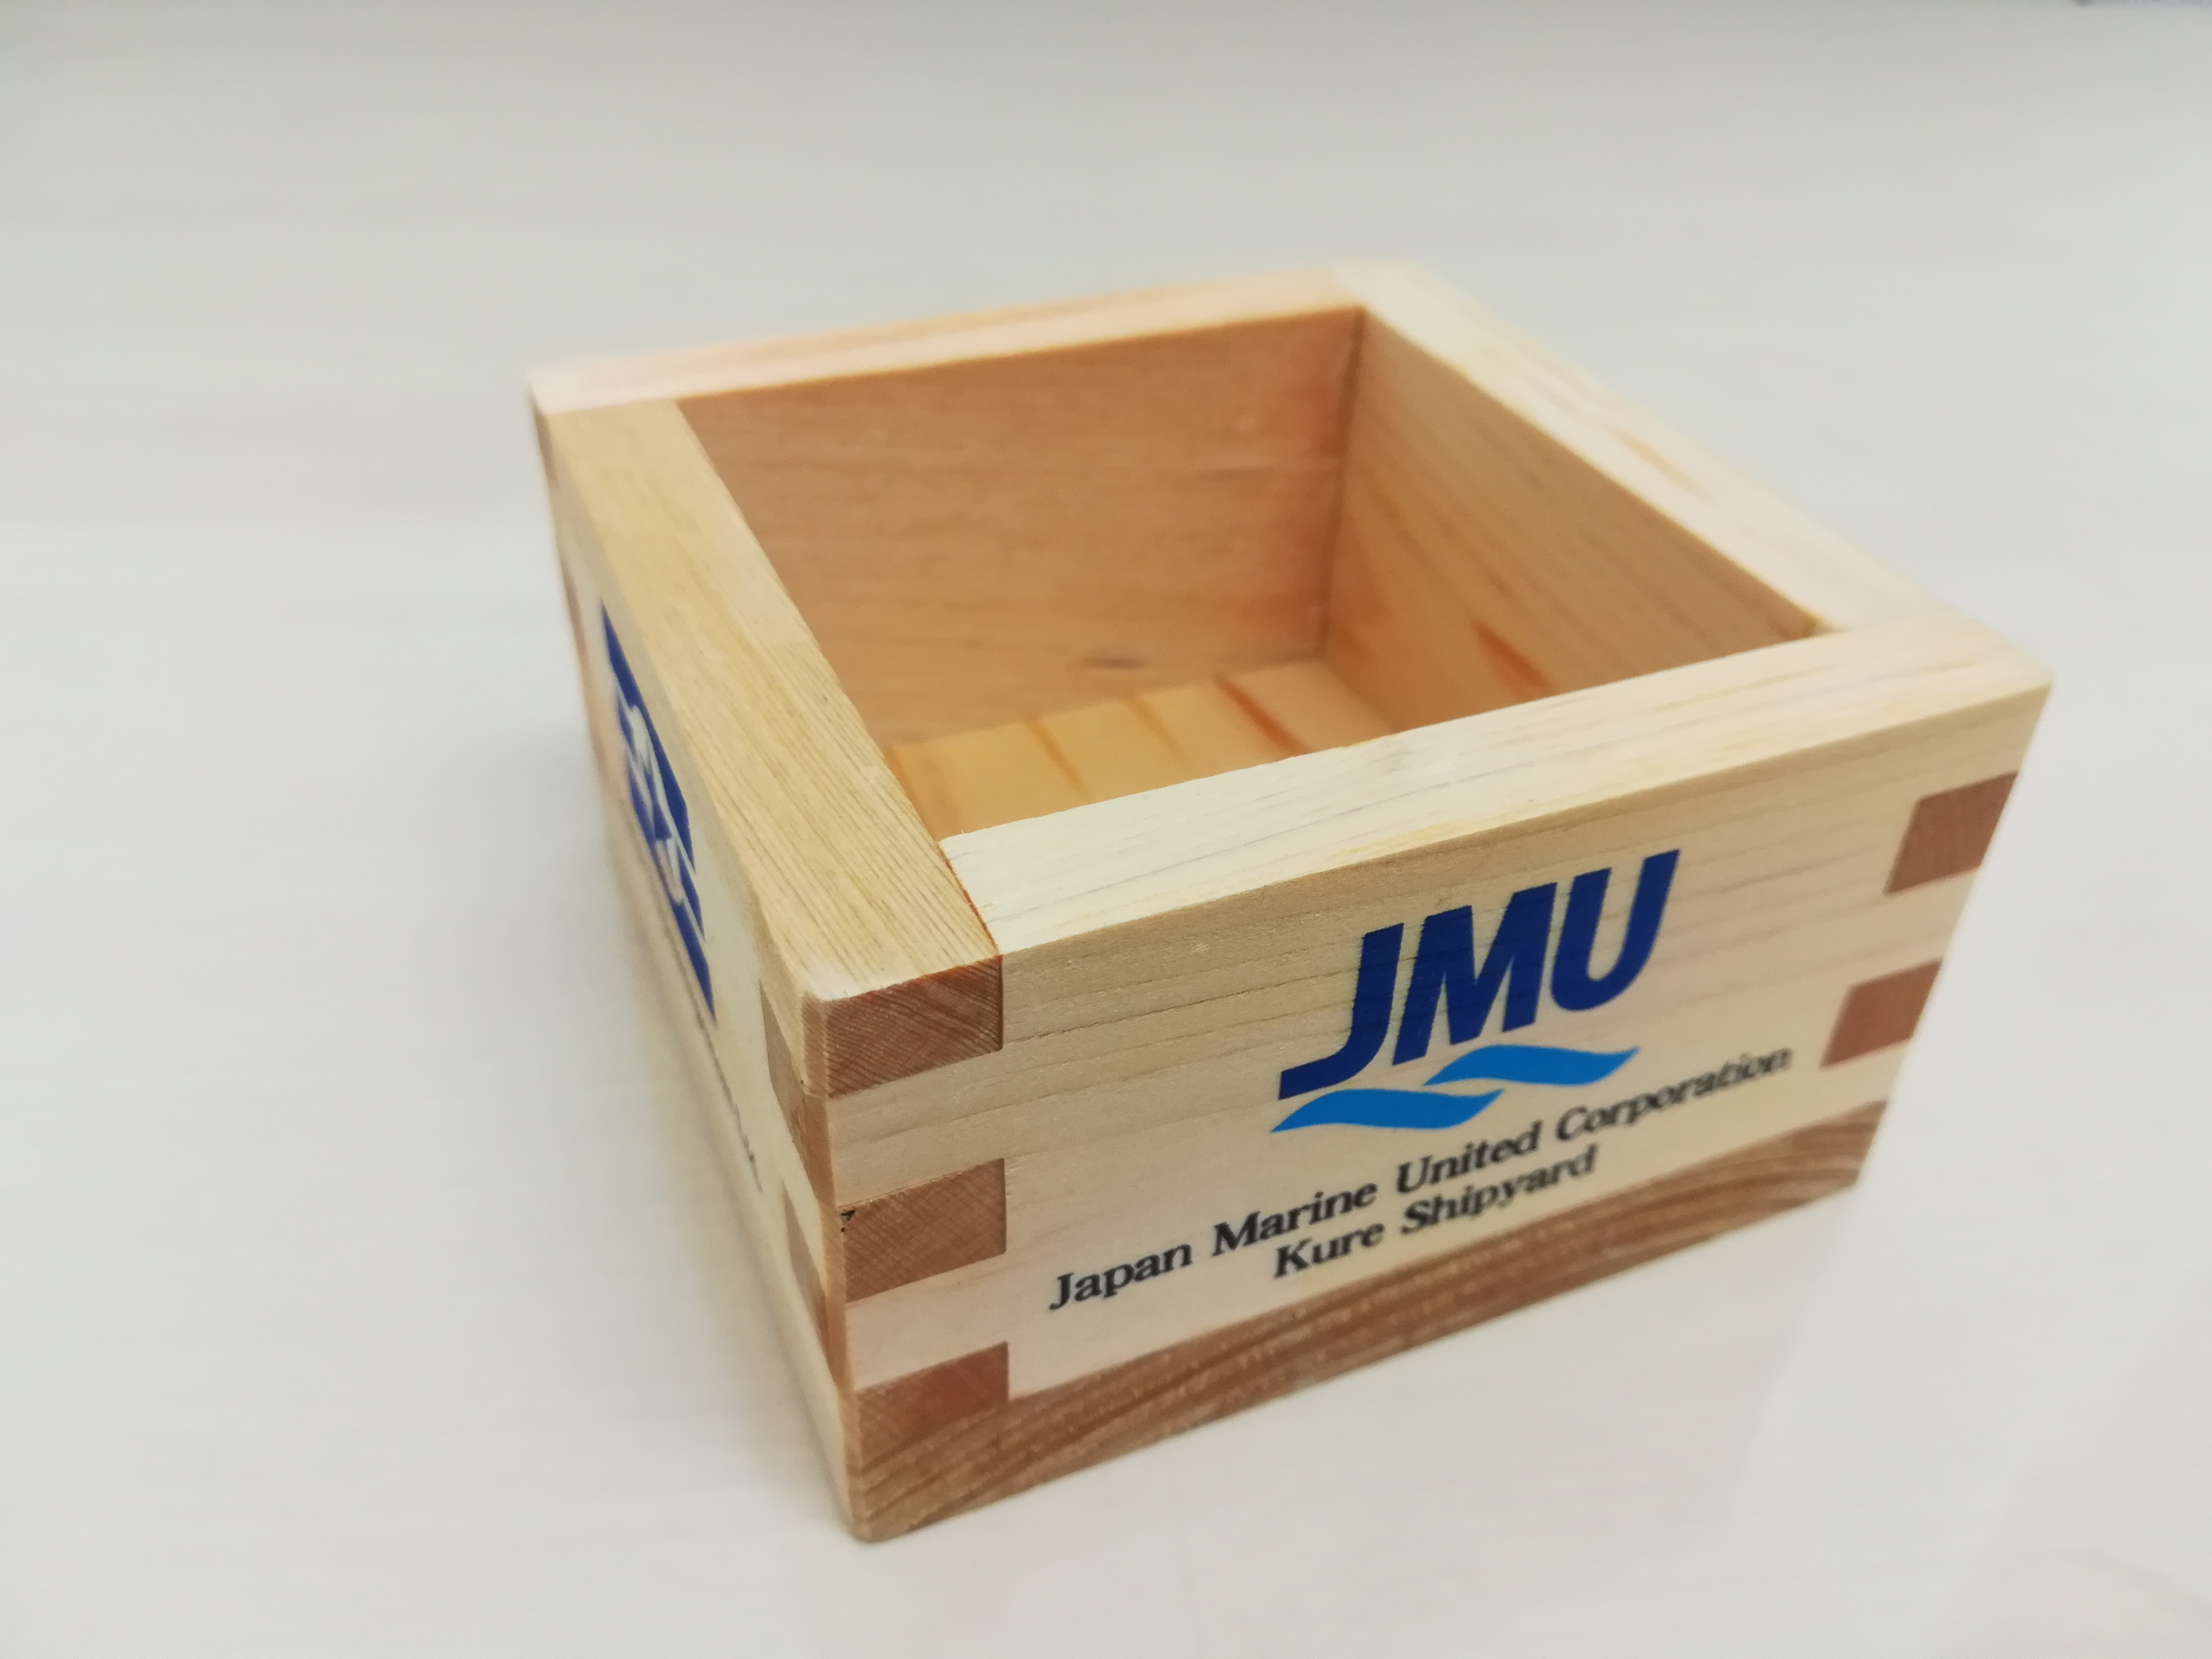 JMU事業者祭の桝